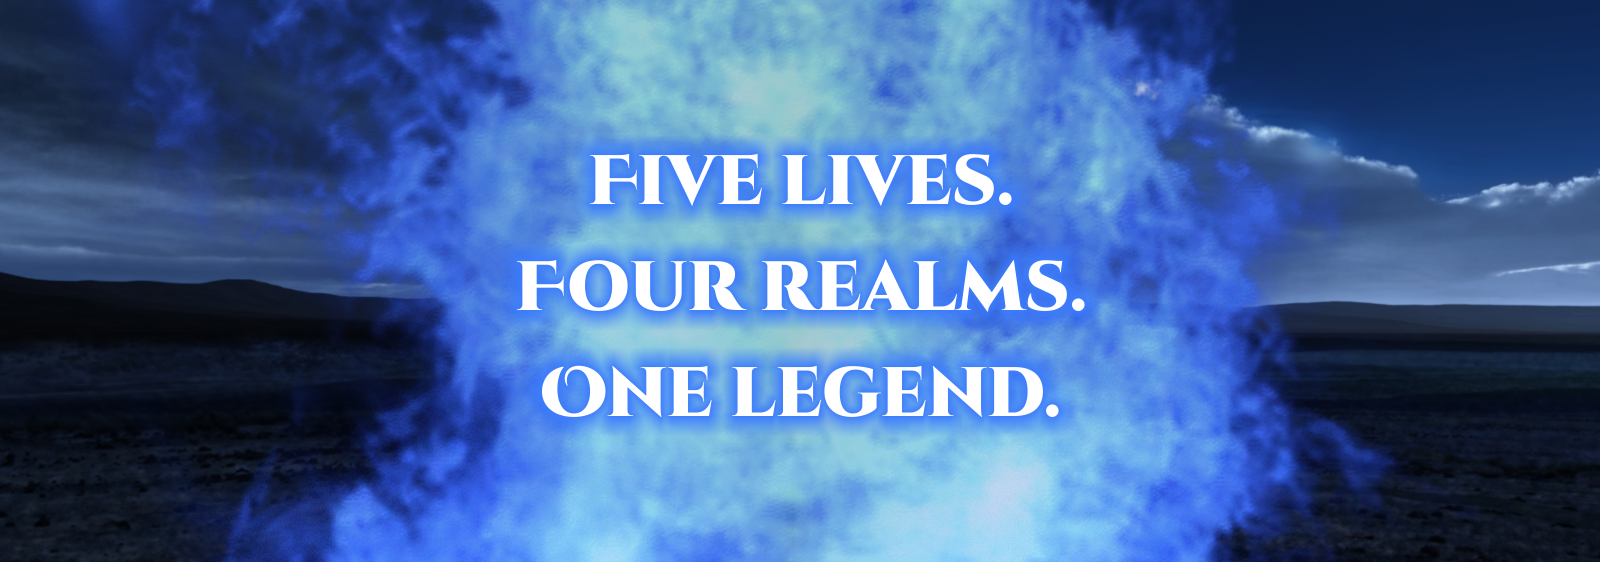 Five lives. Four realms. One legend.